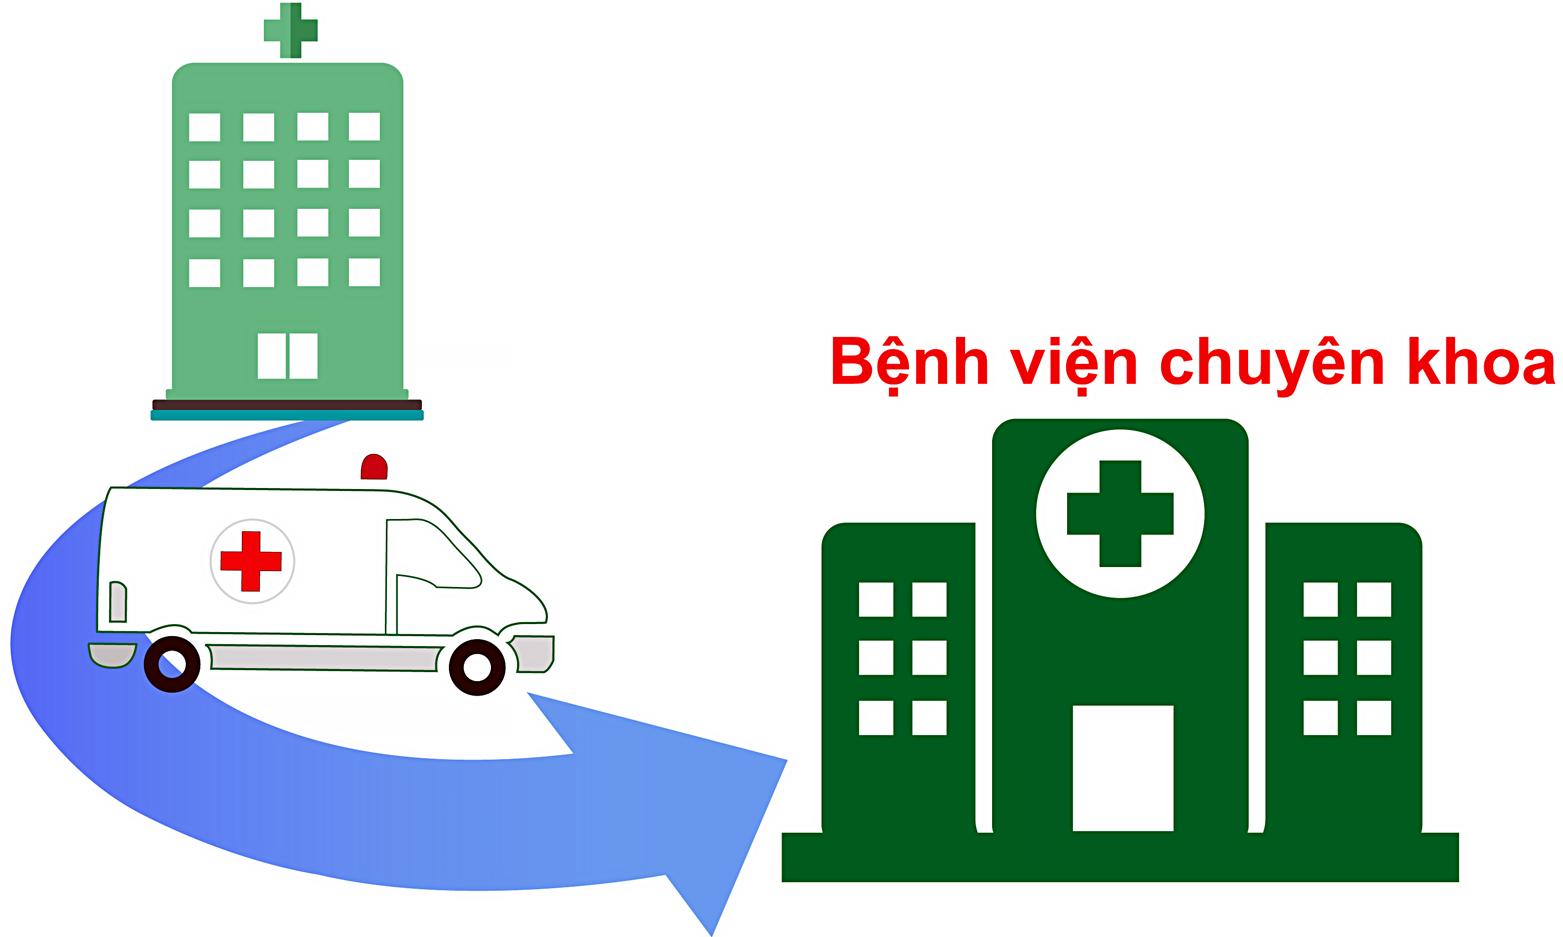 Mua bảo hiểm y tế theo sổ hộ khẩu